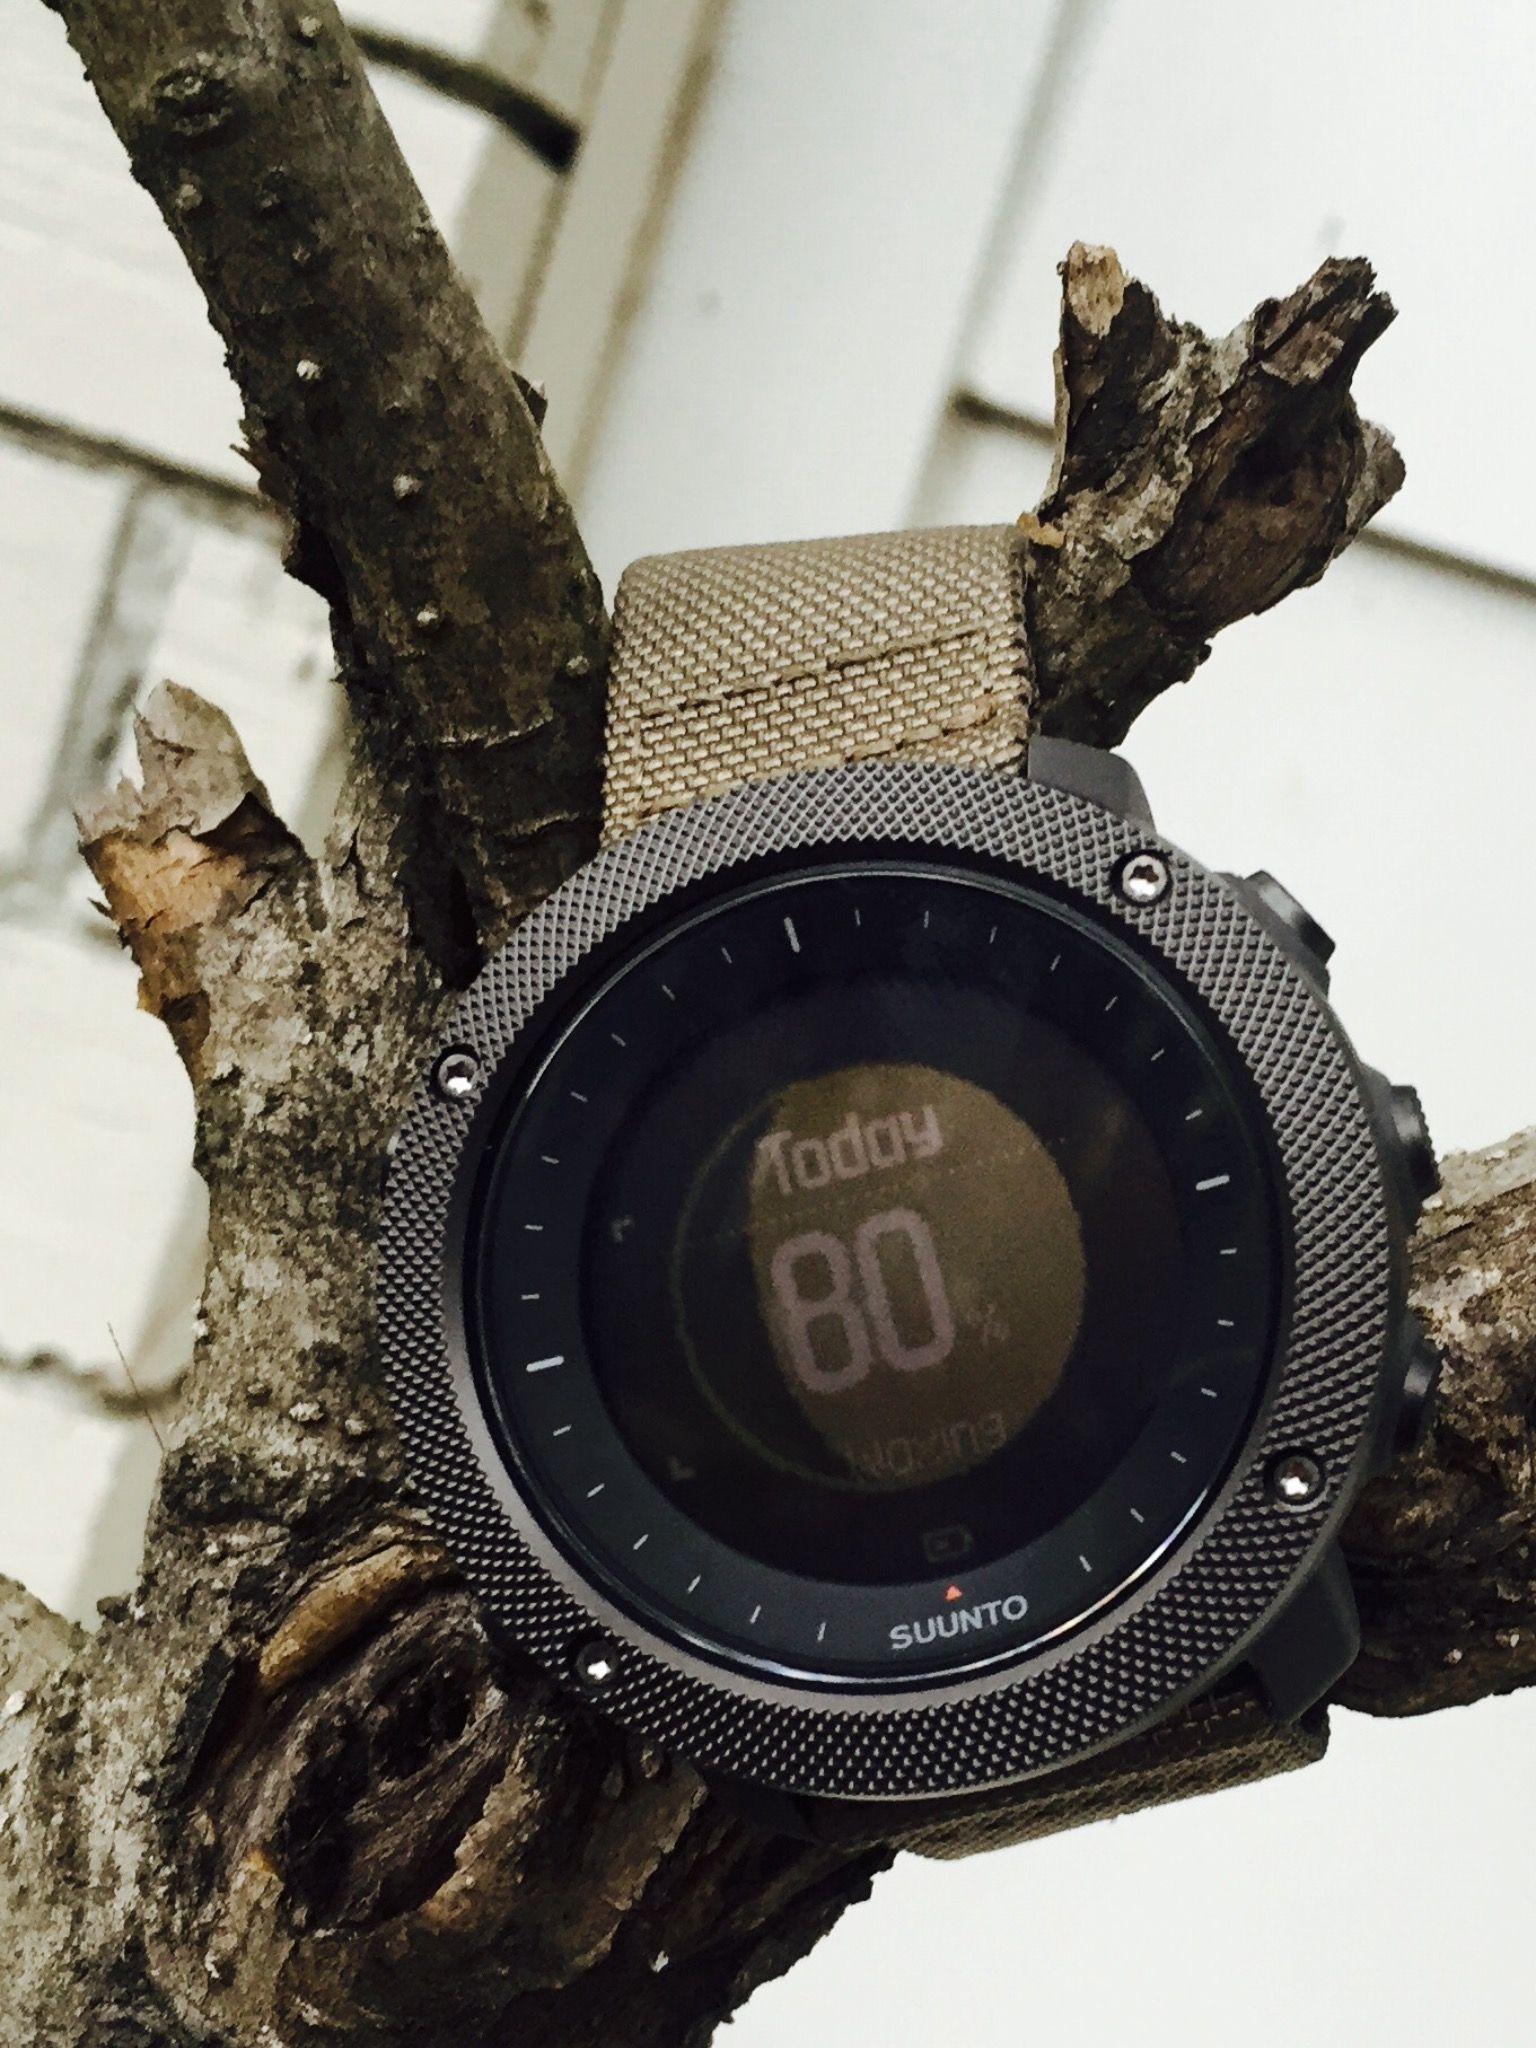 914b1fd70 Suunto Traverse Alpha - Soldier Systems Daily | style | Reloj ...